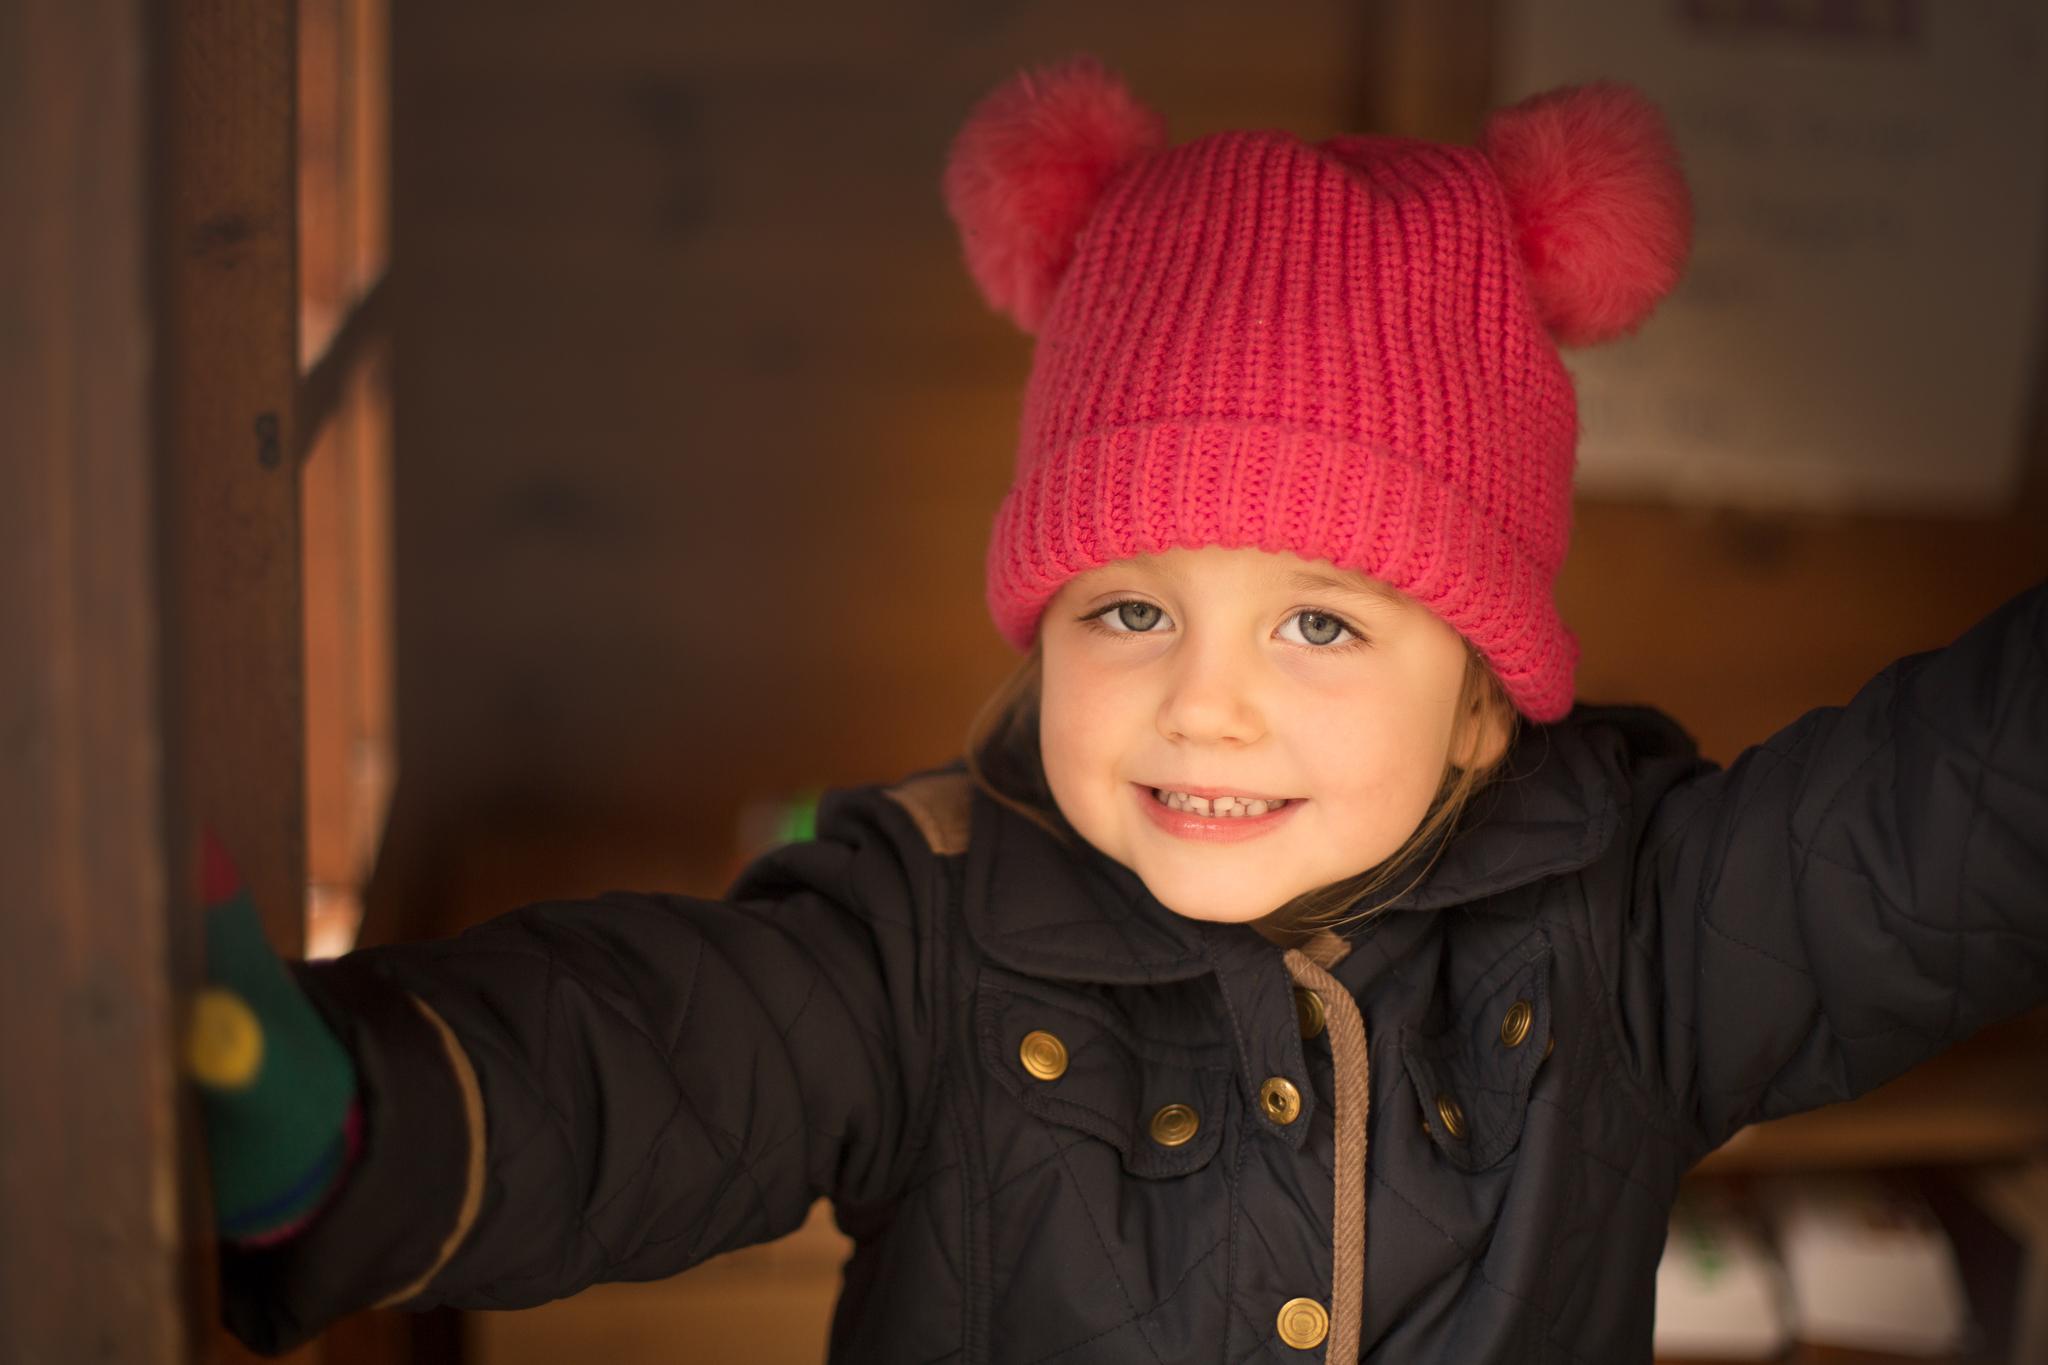 Bedford Family Photographer - Turvey Preschool photos.jpg